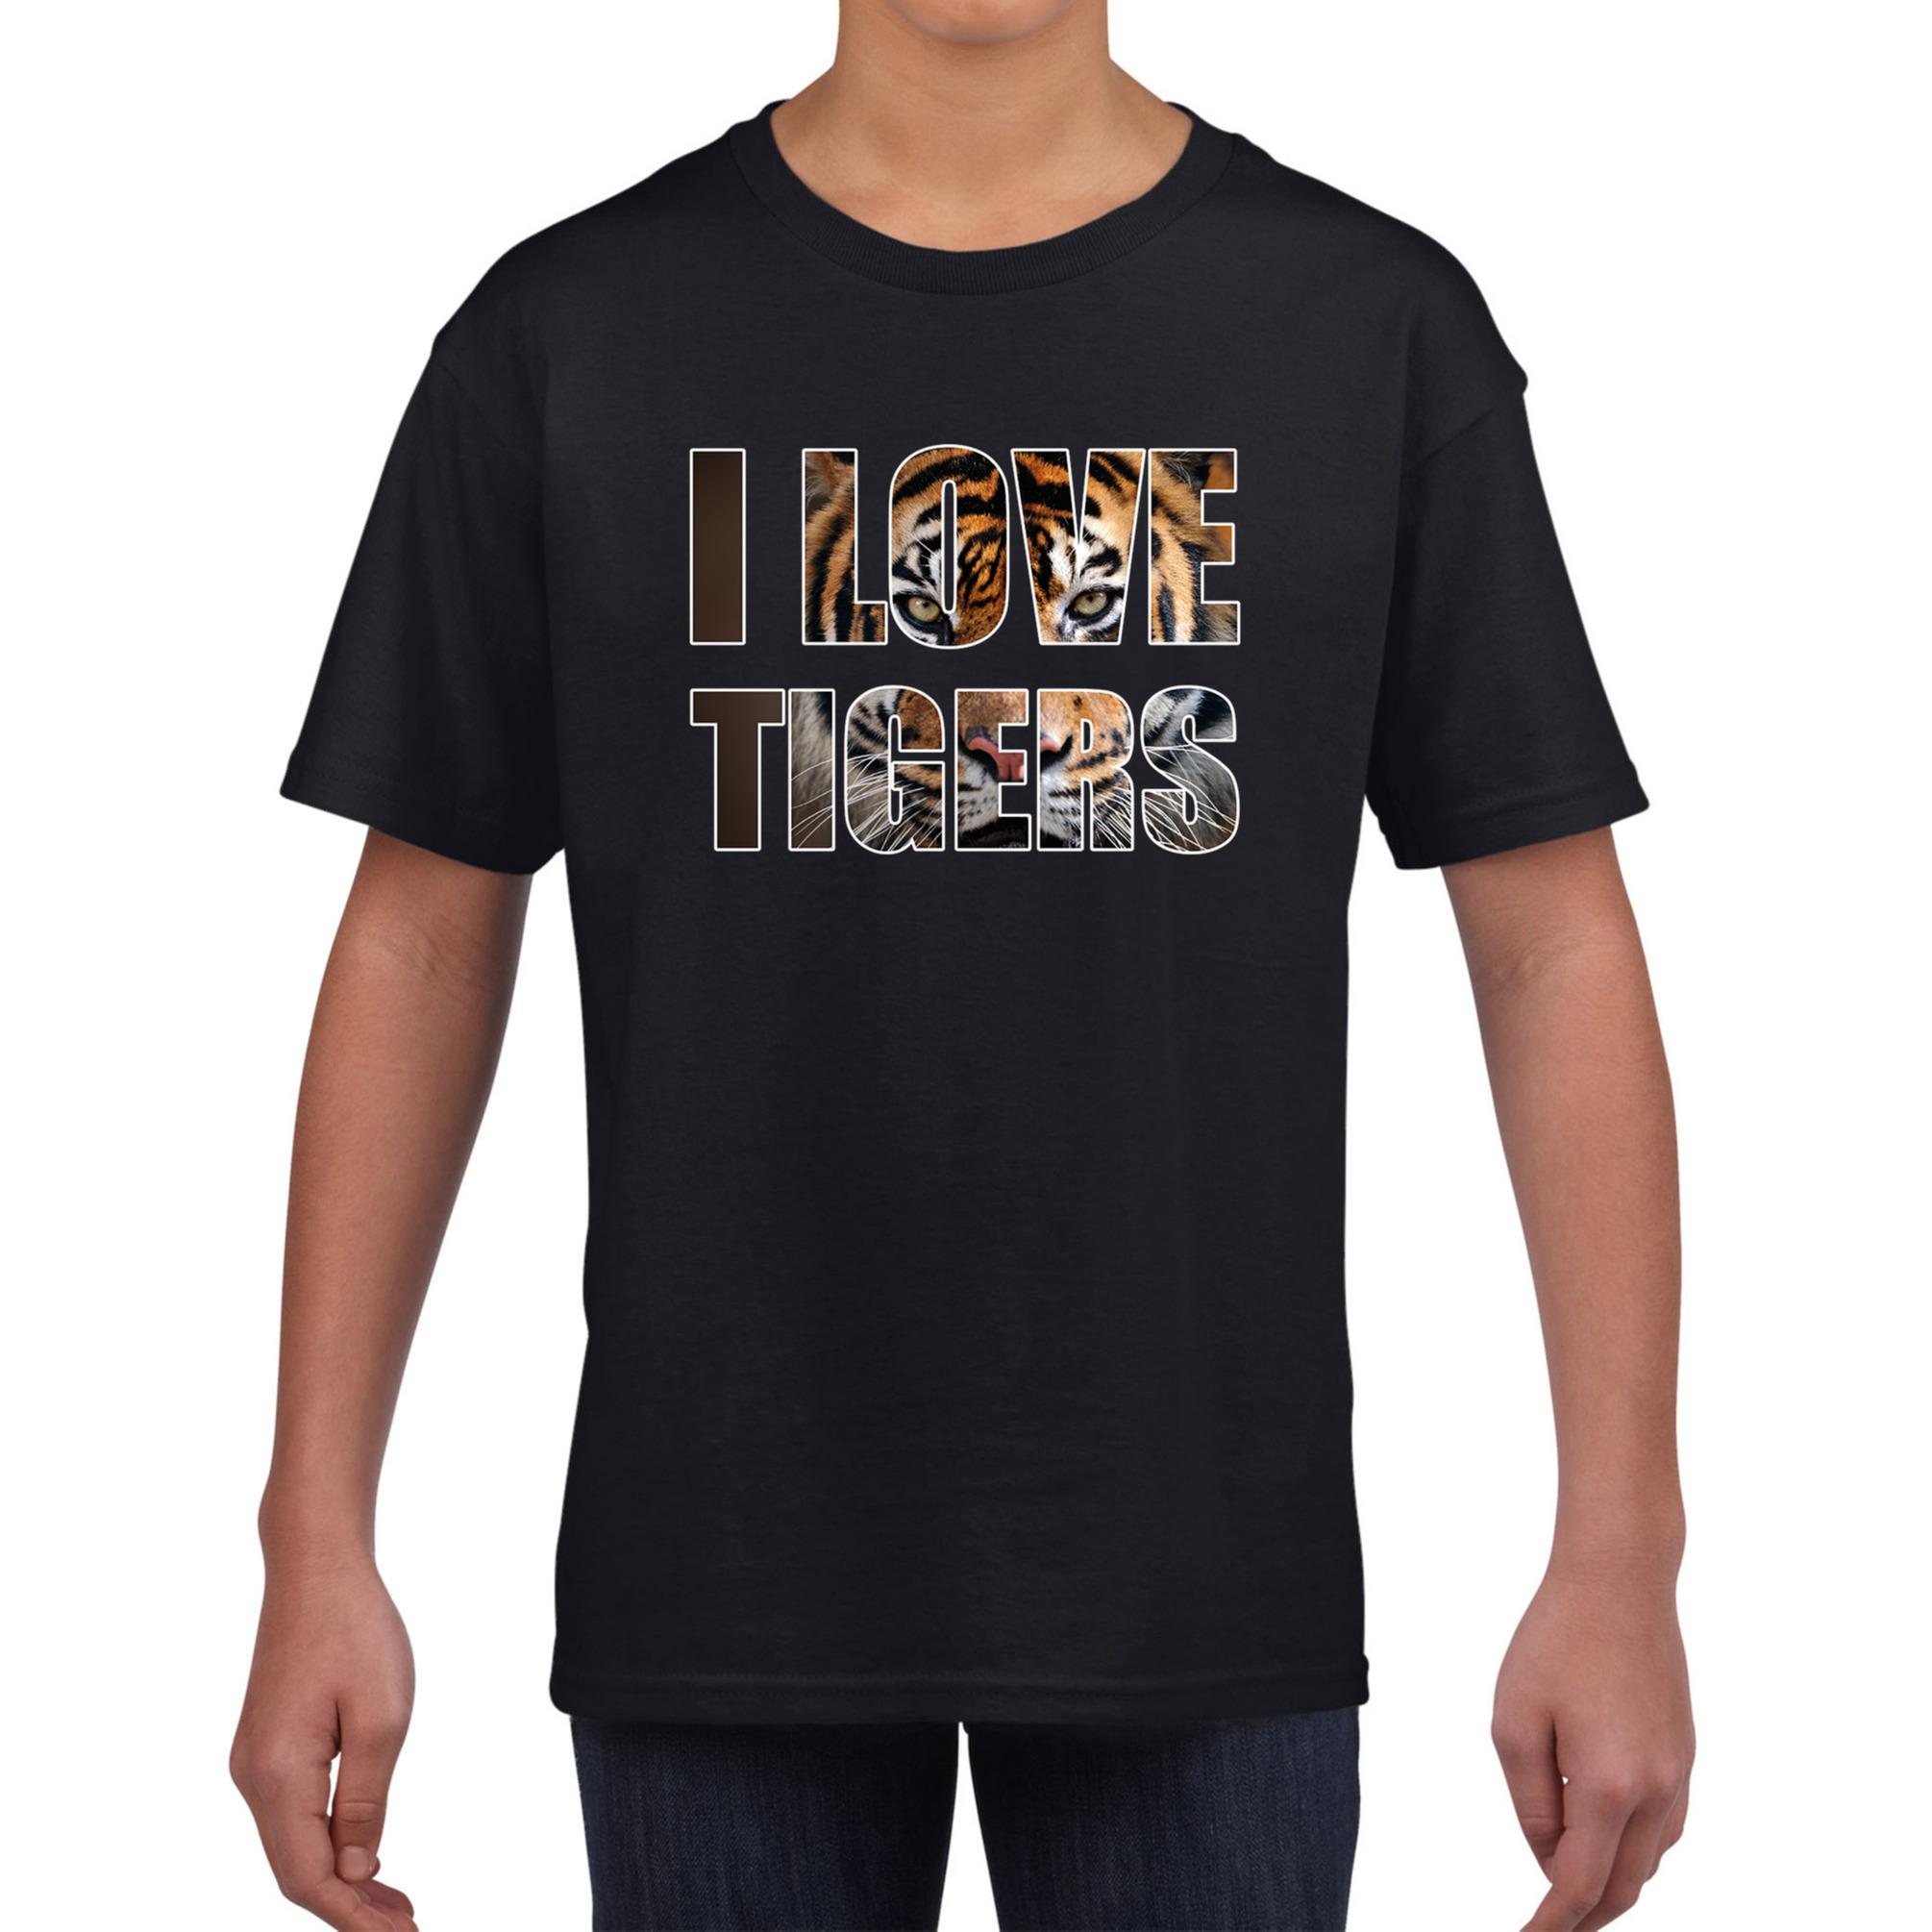 I love tigers - tijgers dieren shirt zwart kids